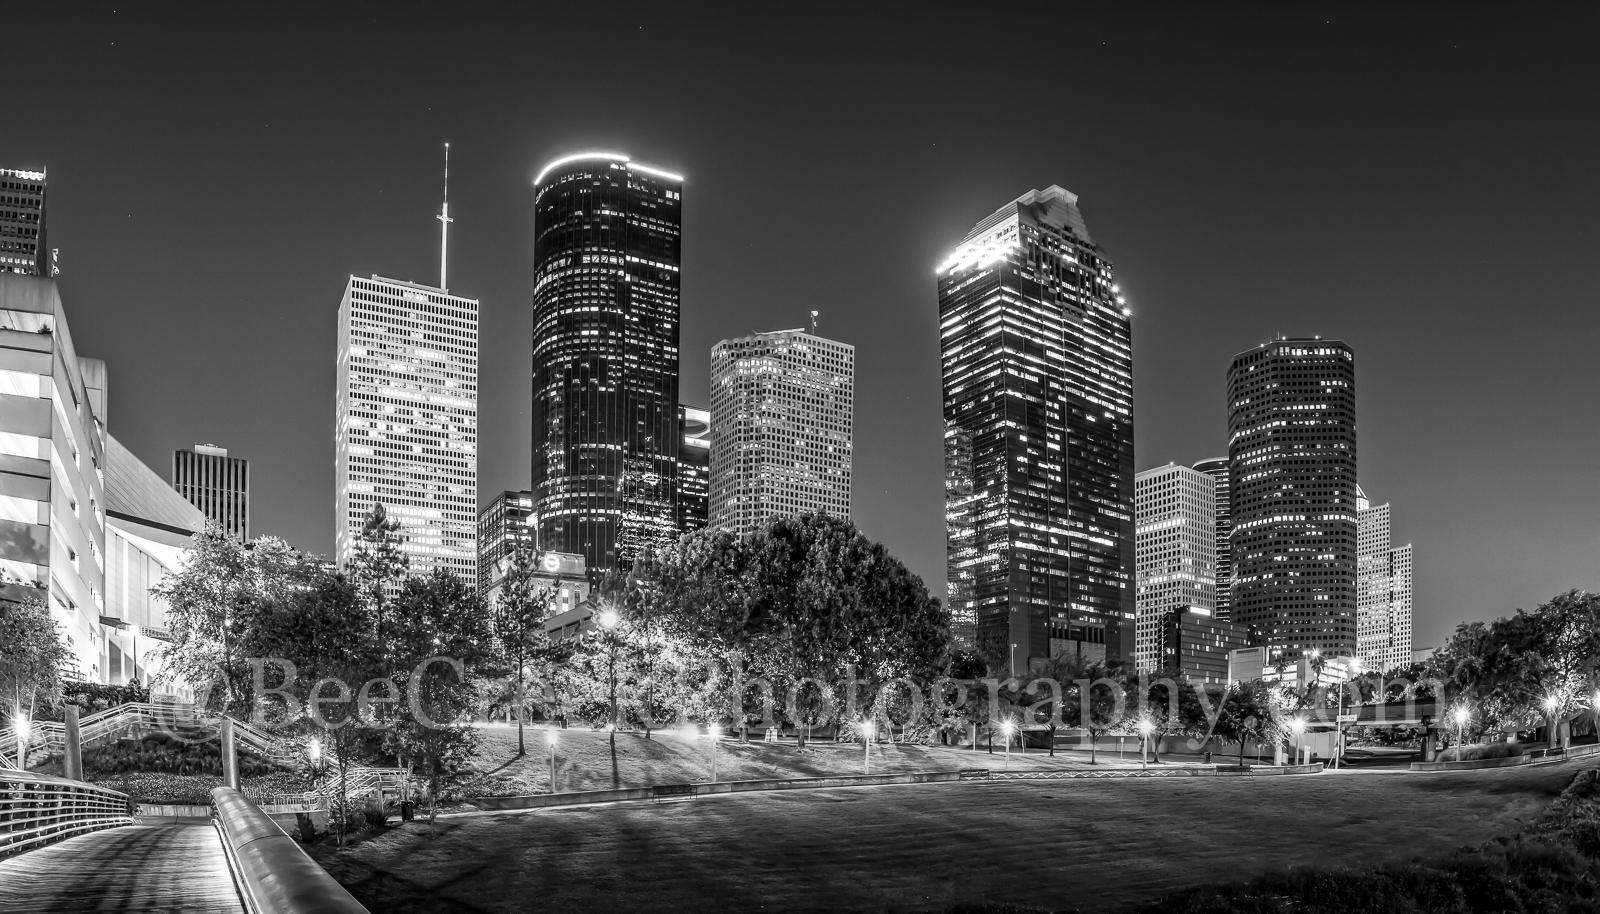 Houston, bagby to sabine, promenade, bridge, downtown, skyline, BW, black and white, dusk, pedestrian bridges, america, cityscapes, buffalo bayou, water, reflections, stock bridge photos, stock bridge, photo